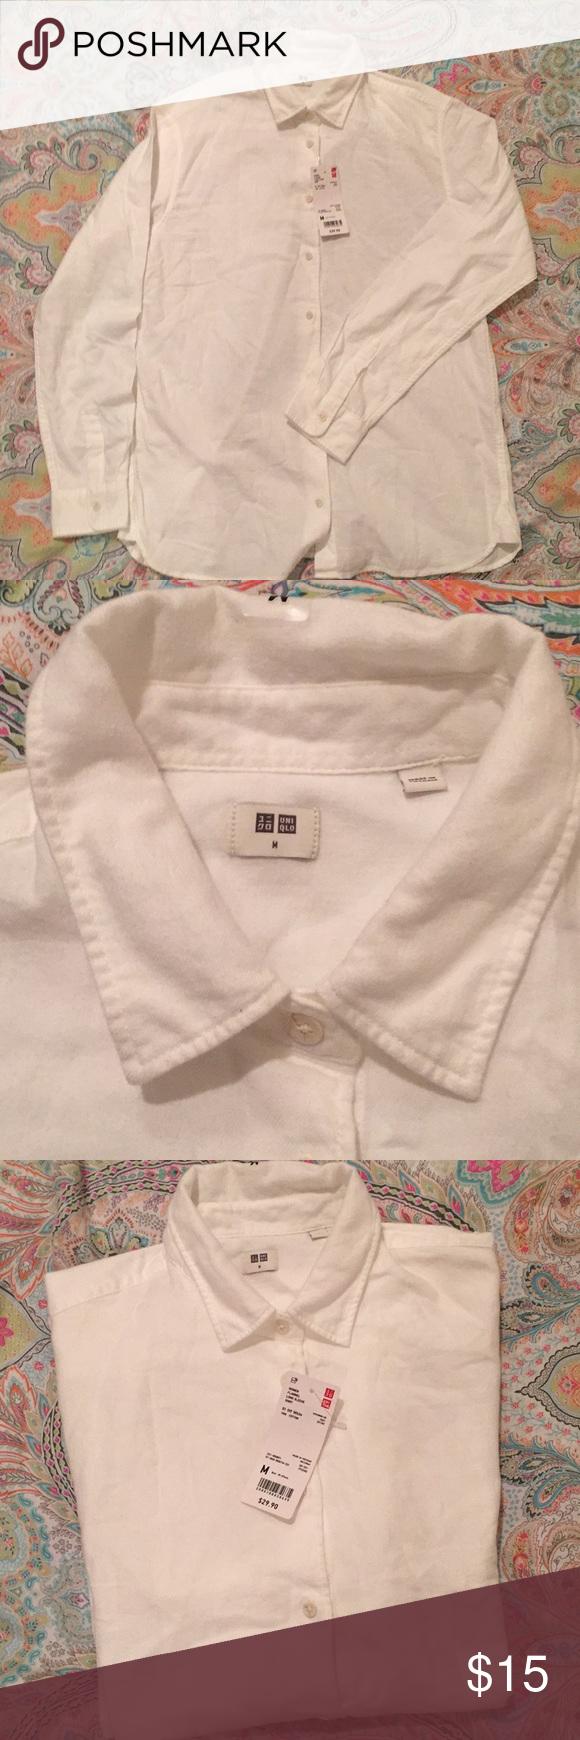 Uniqlo flannel jacket  Uniqlo LS flannel NWT  Uniqlo Flannels and Flannel shirts